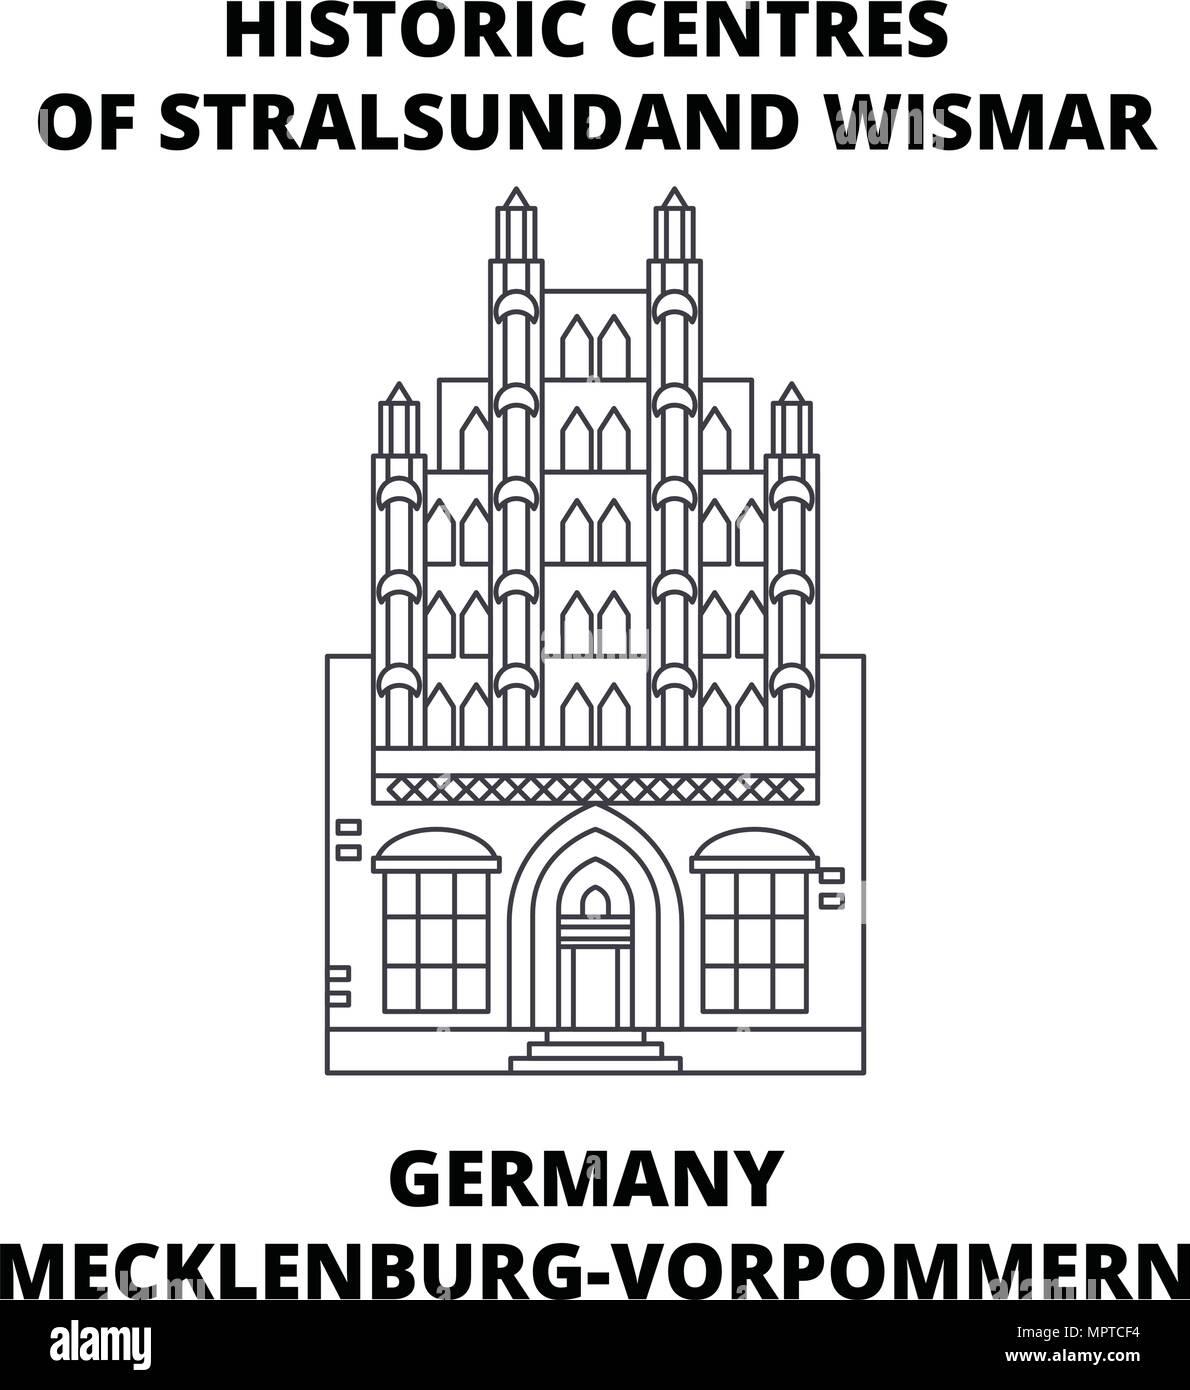 Germany, Mecklenburg-Vorpommern, Historic Centres Of Stralsundand Wismar line icon concept. - Stock Vector